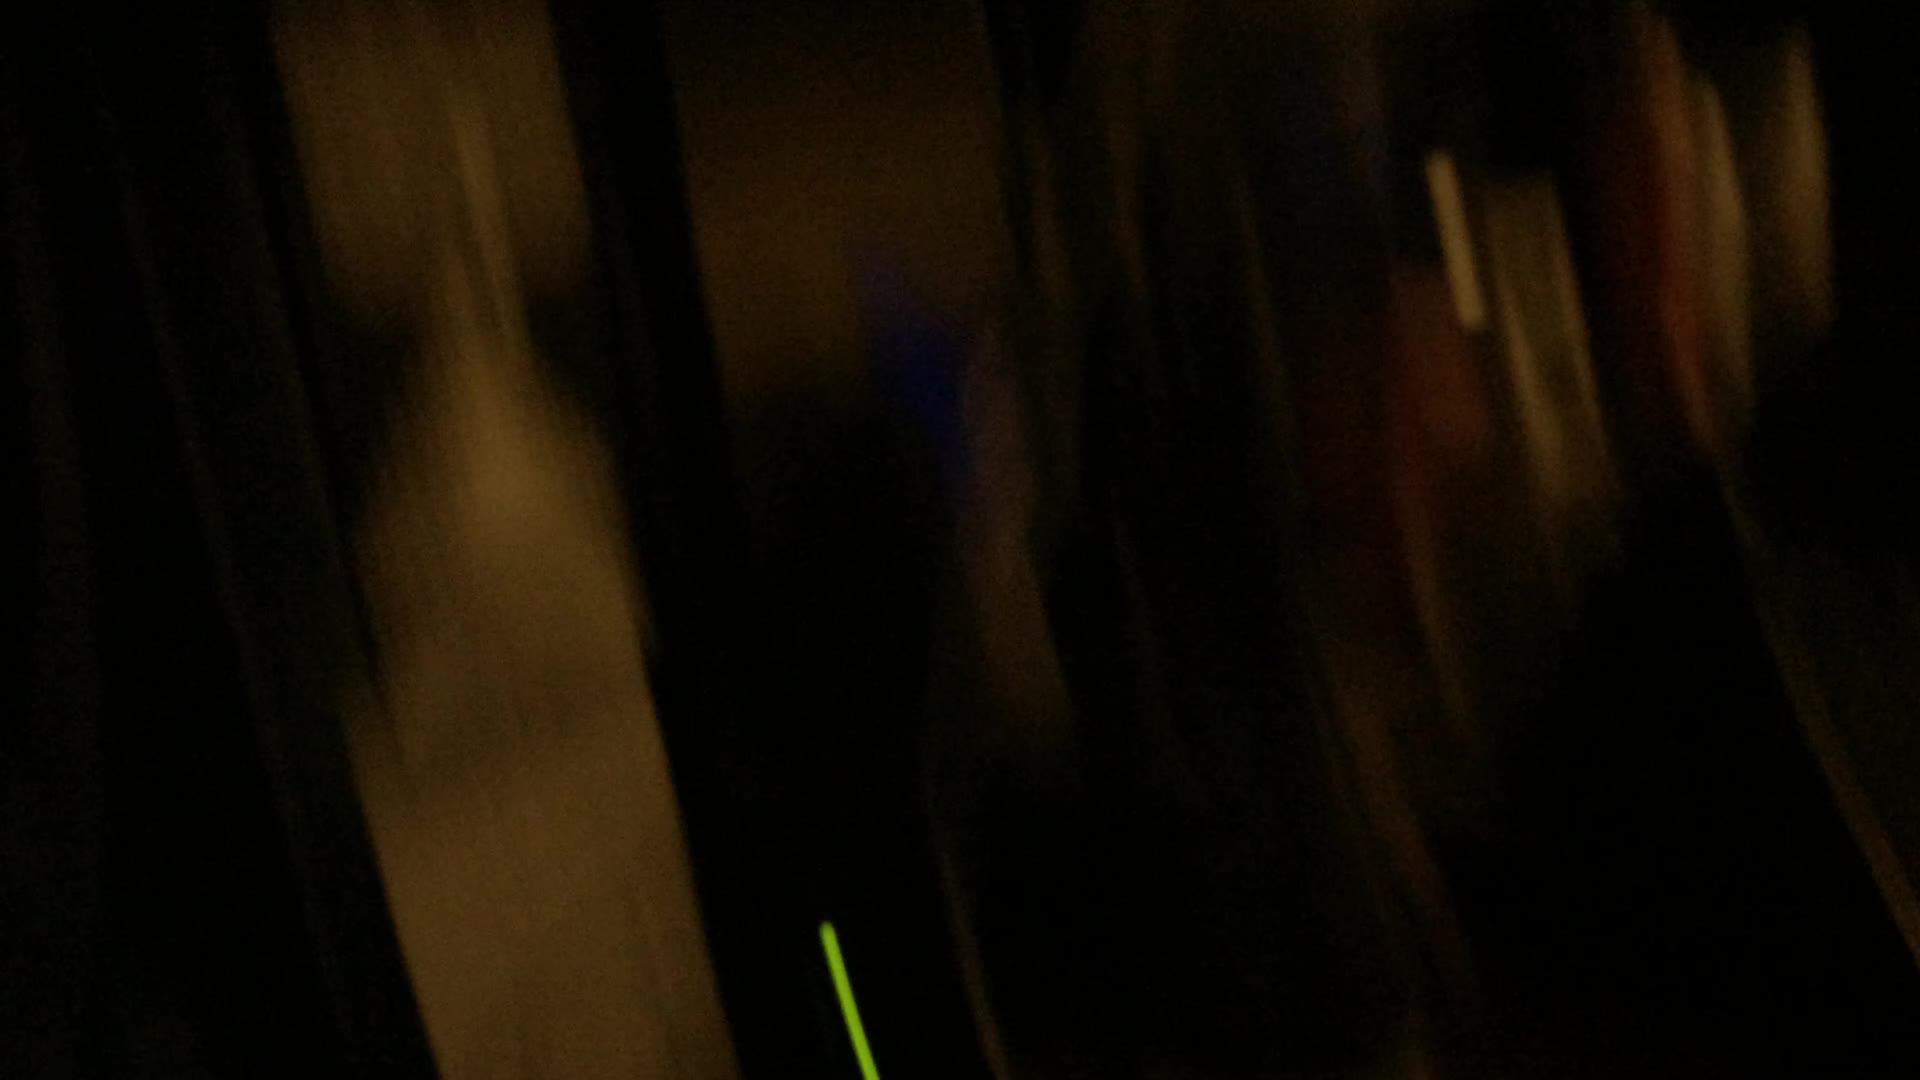 darksouls2, Dark Souls 2 Bell Keeper Infinite HP Cheater GIFs